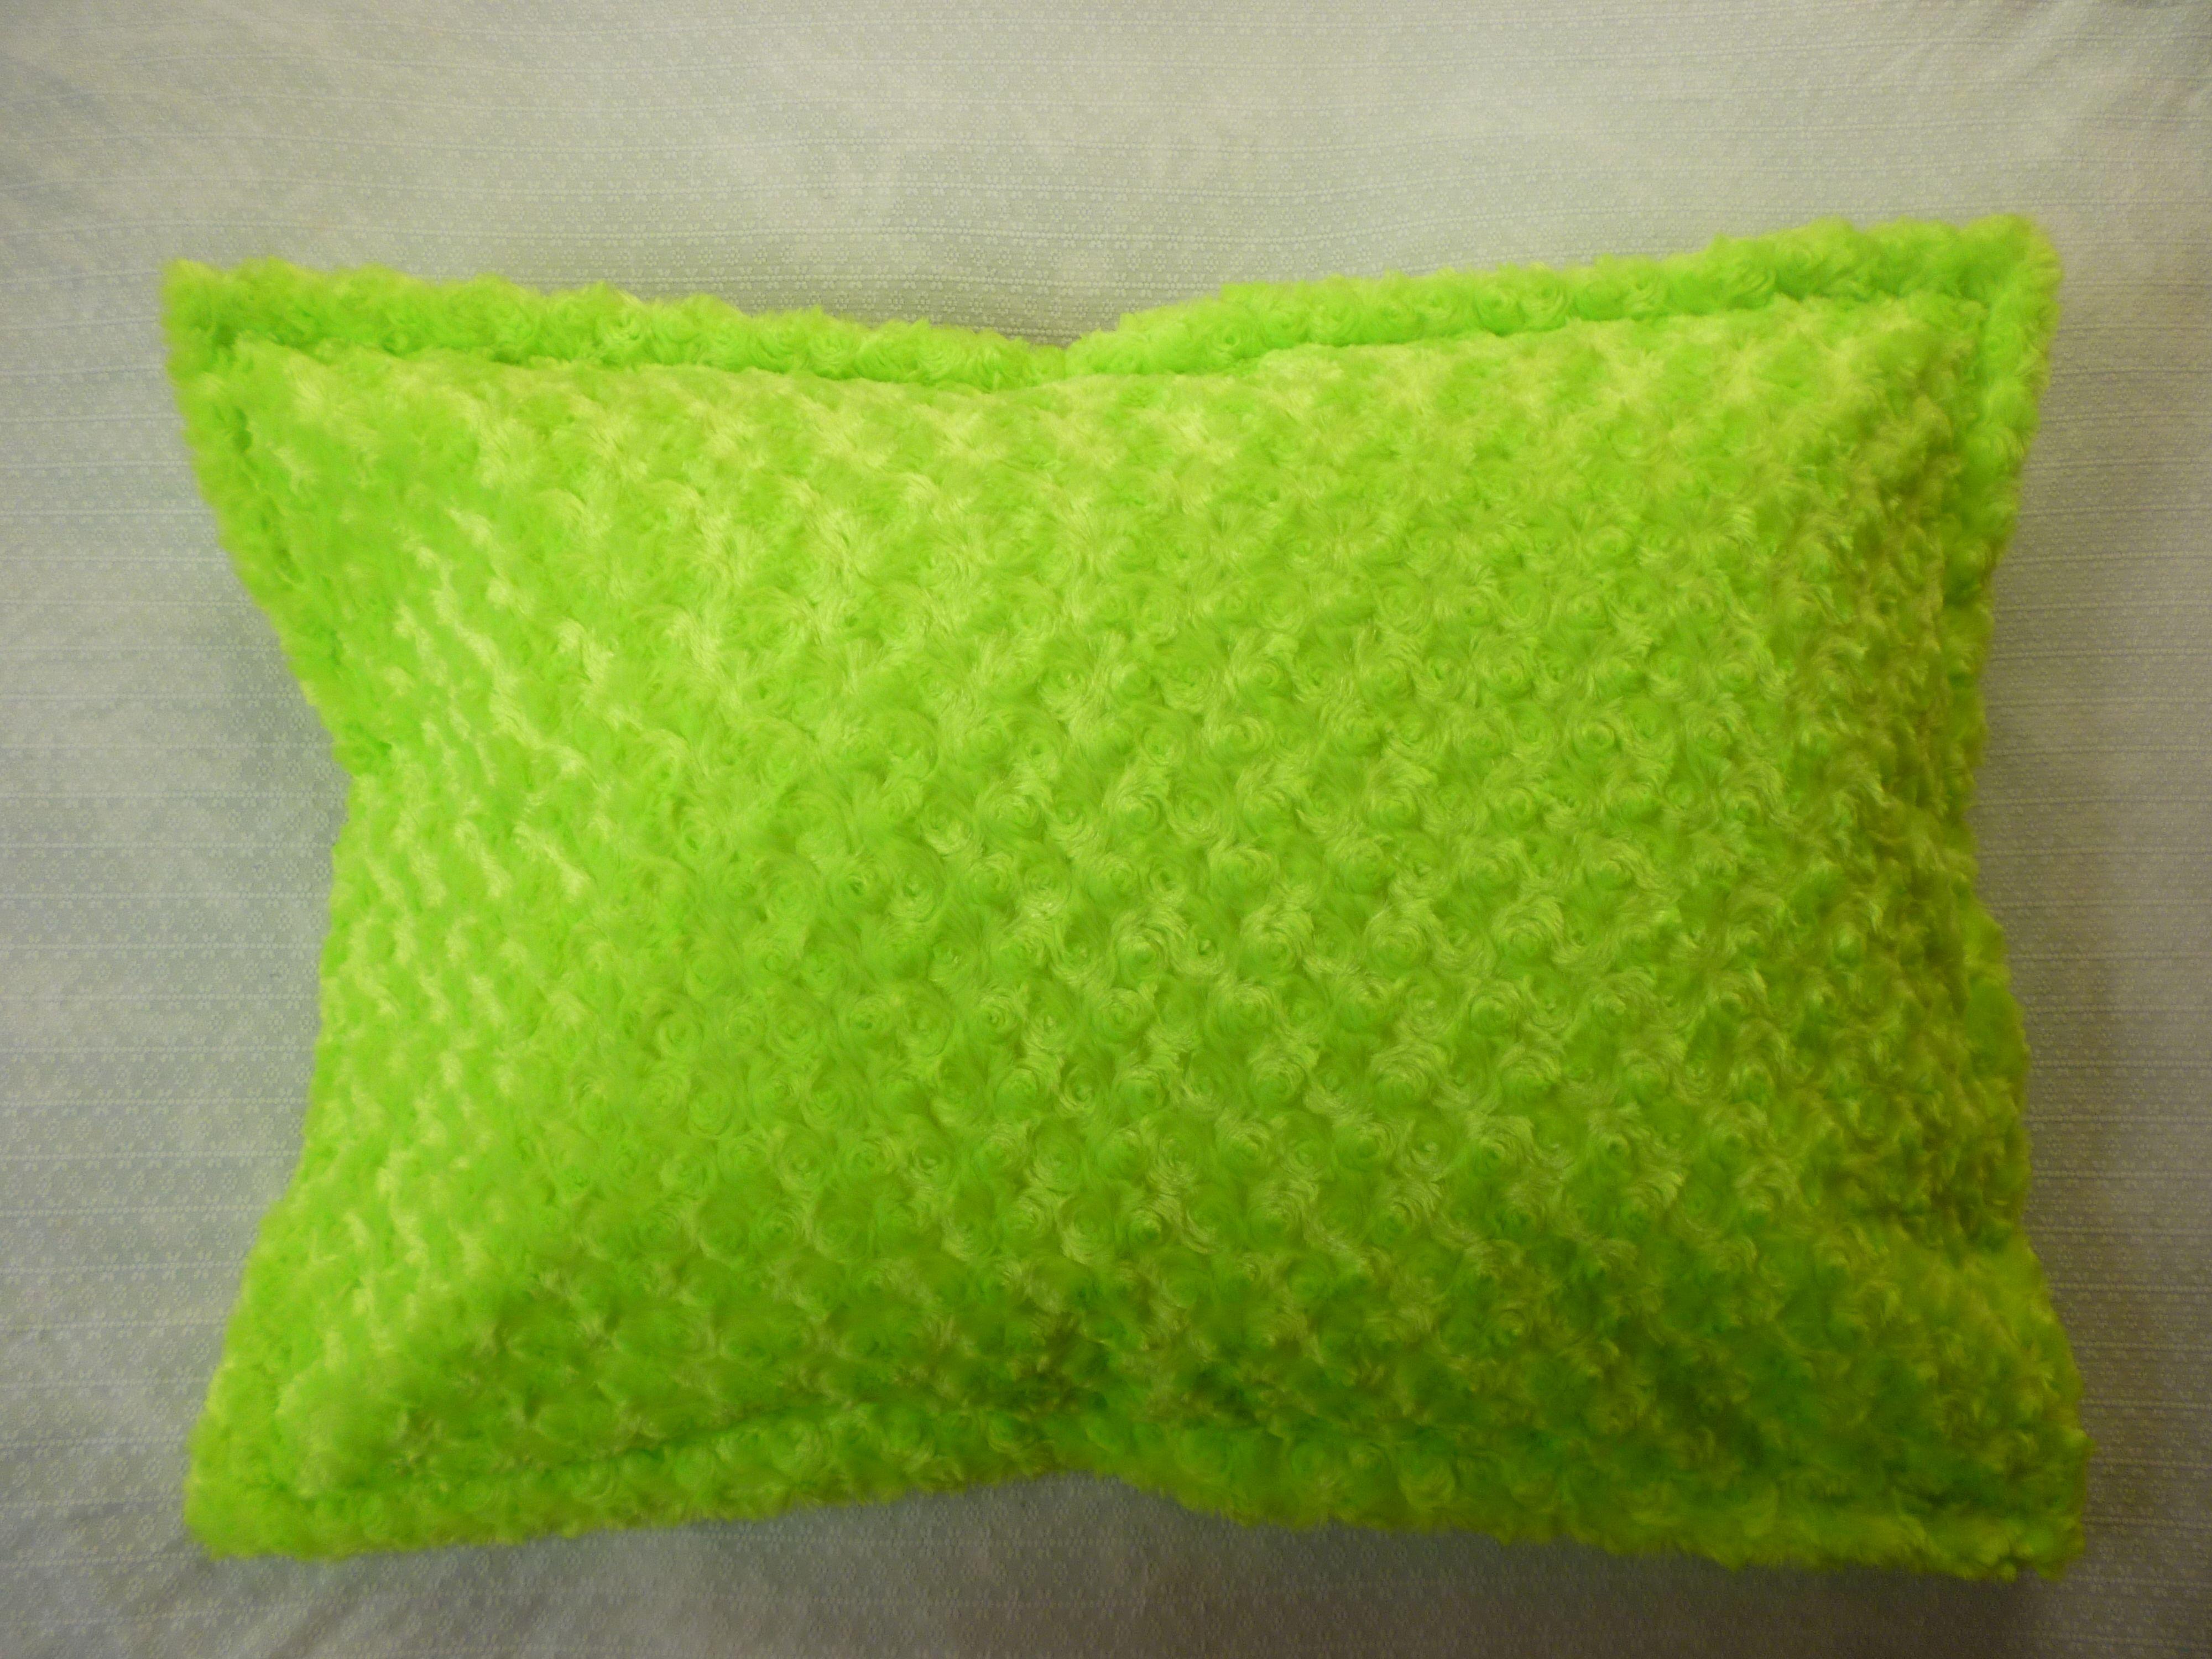 funda - remolino verde neon